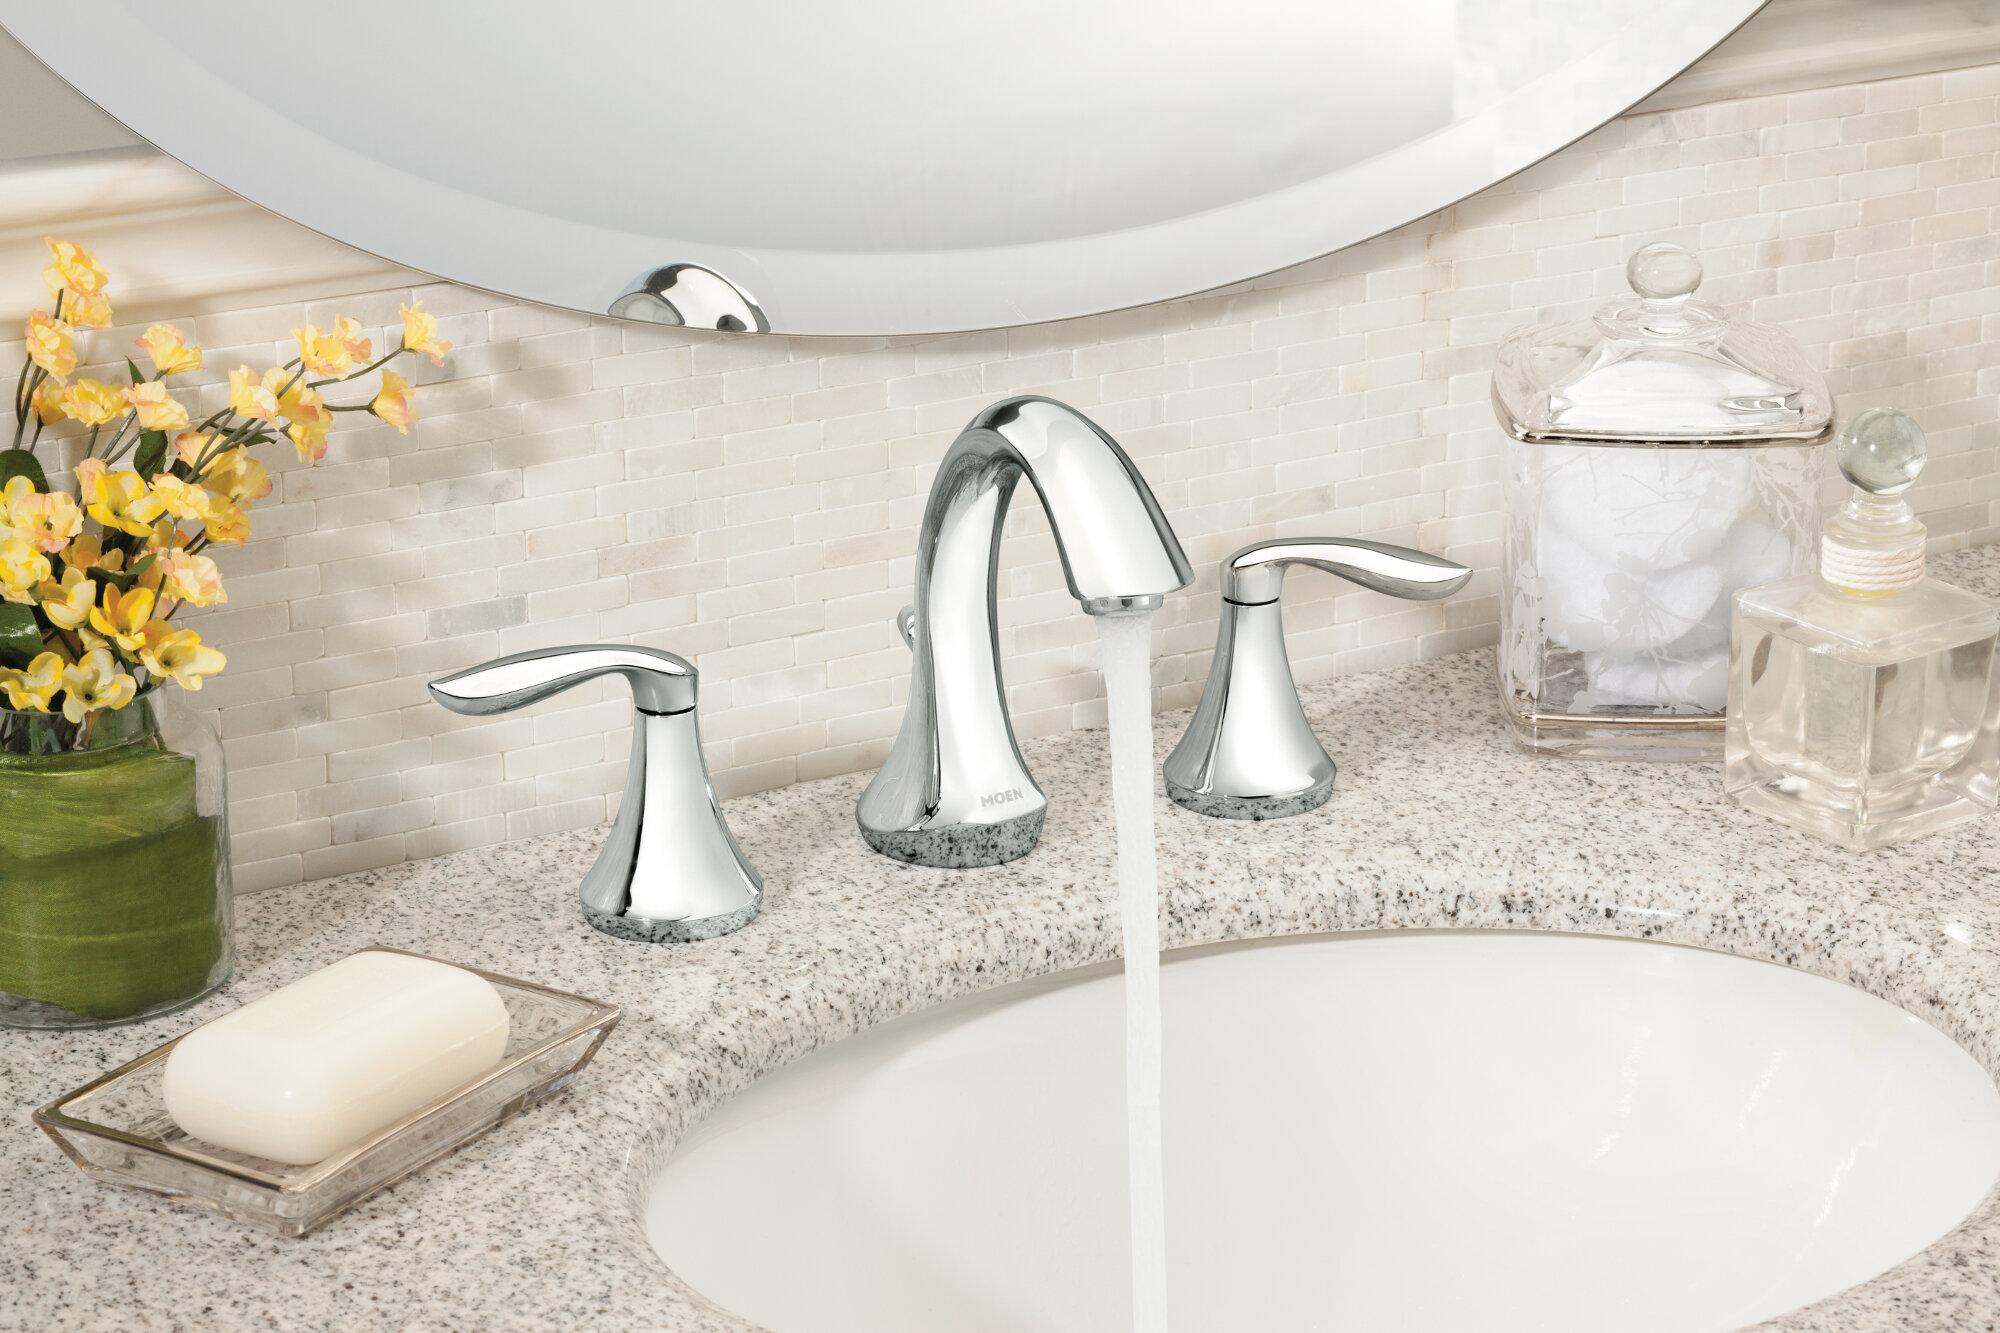 Moen Eva Widespread Bathroom Faucet & Reviews | Wayfair